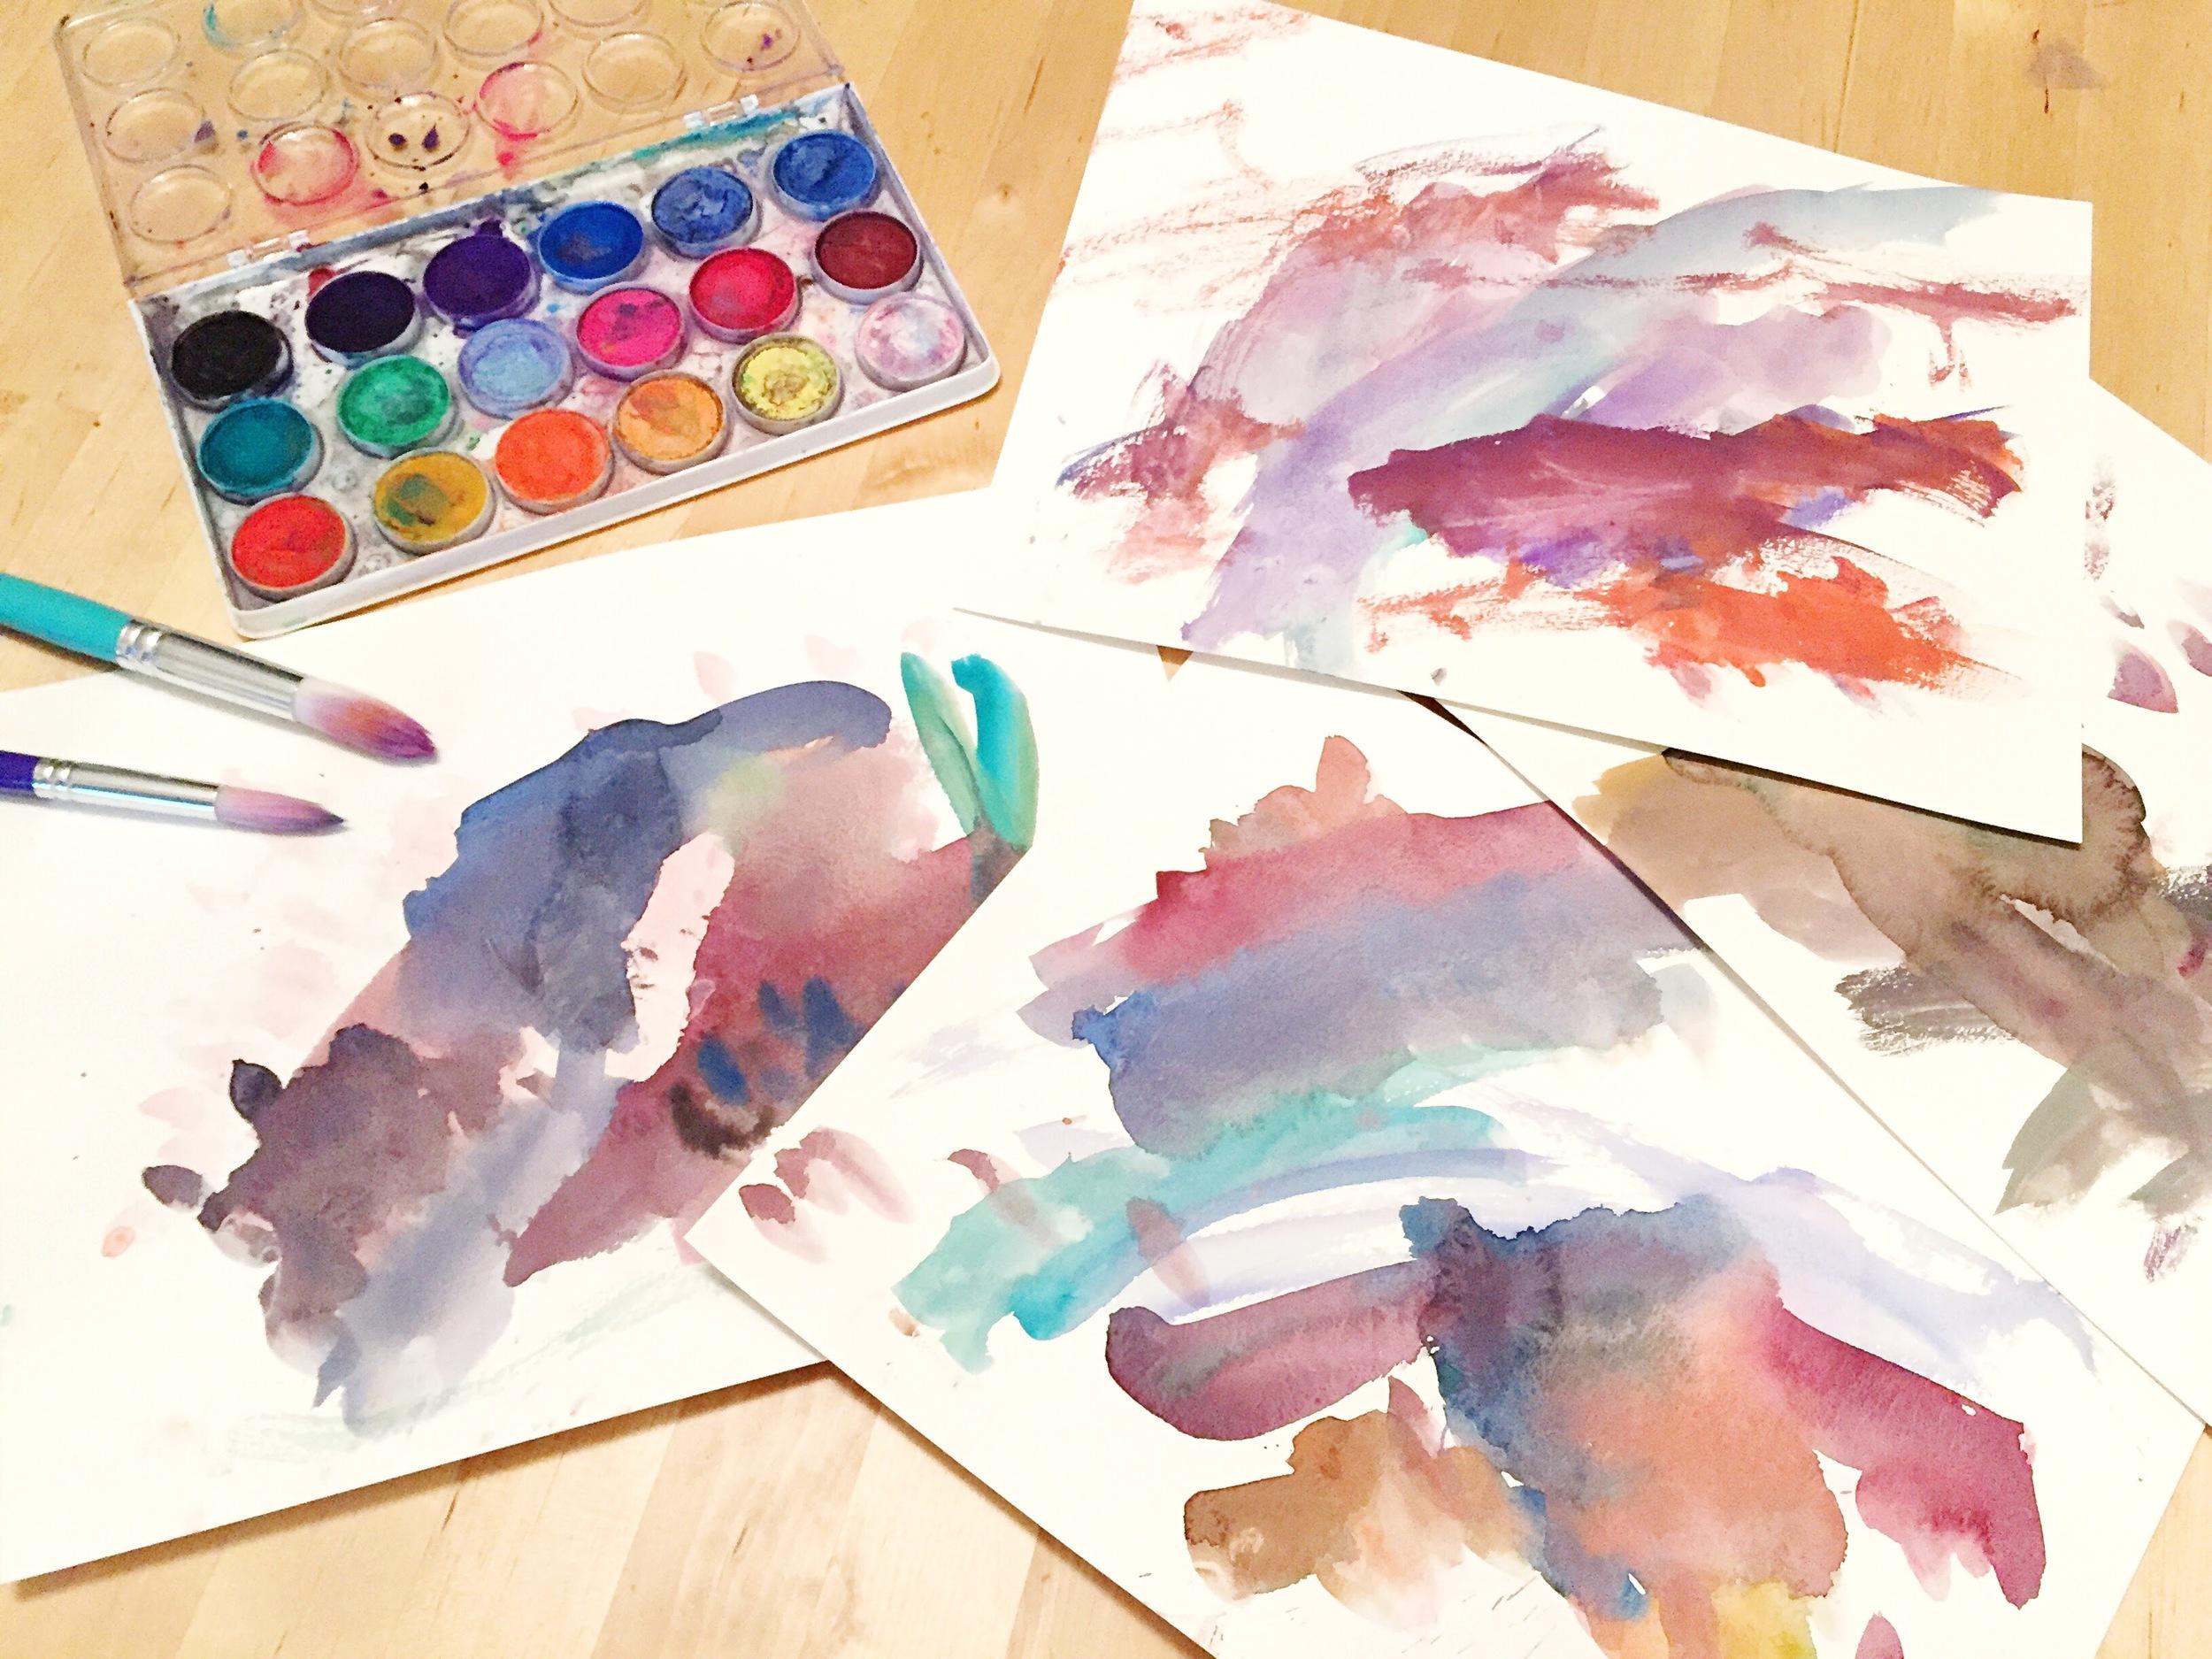 B's watercolor paintings - very Fall-LIke colors